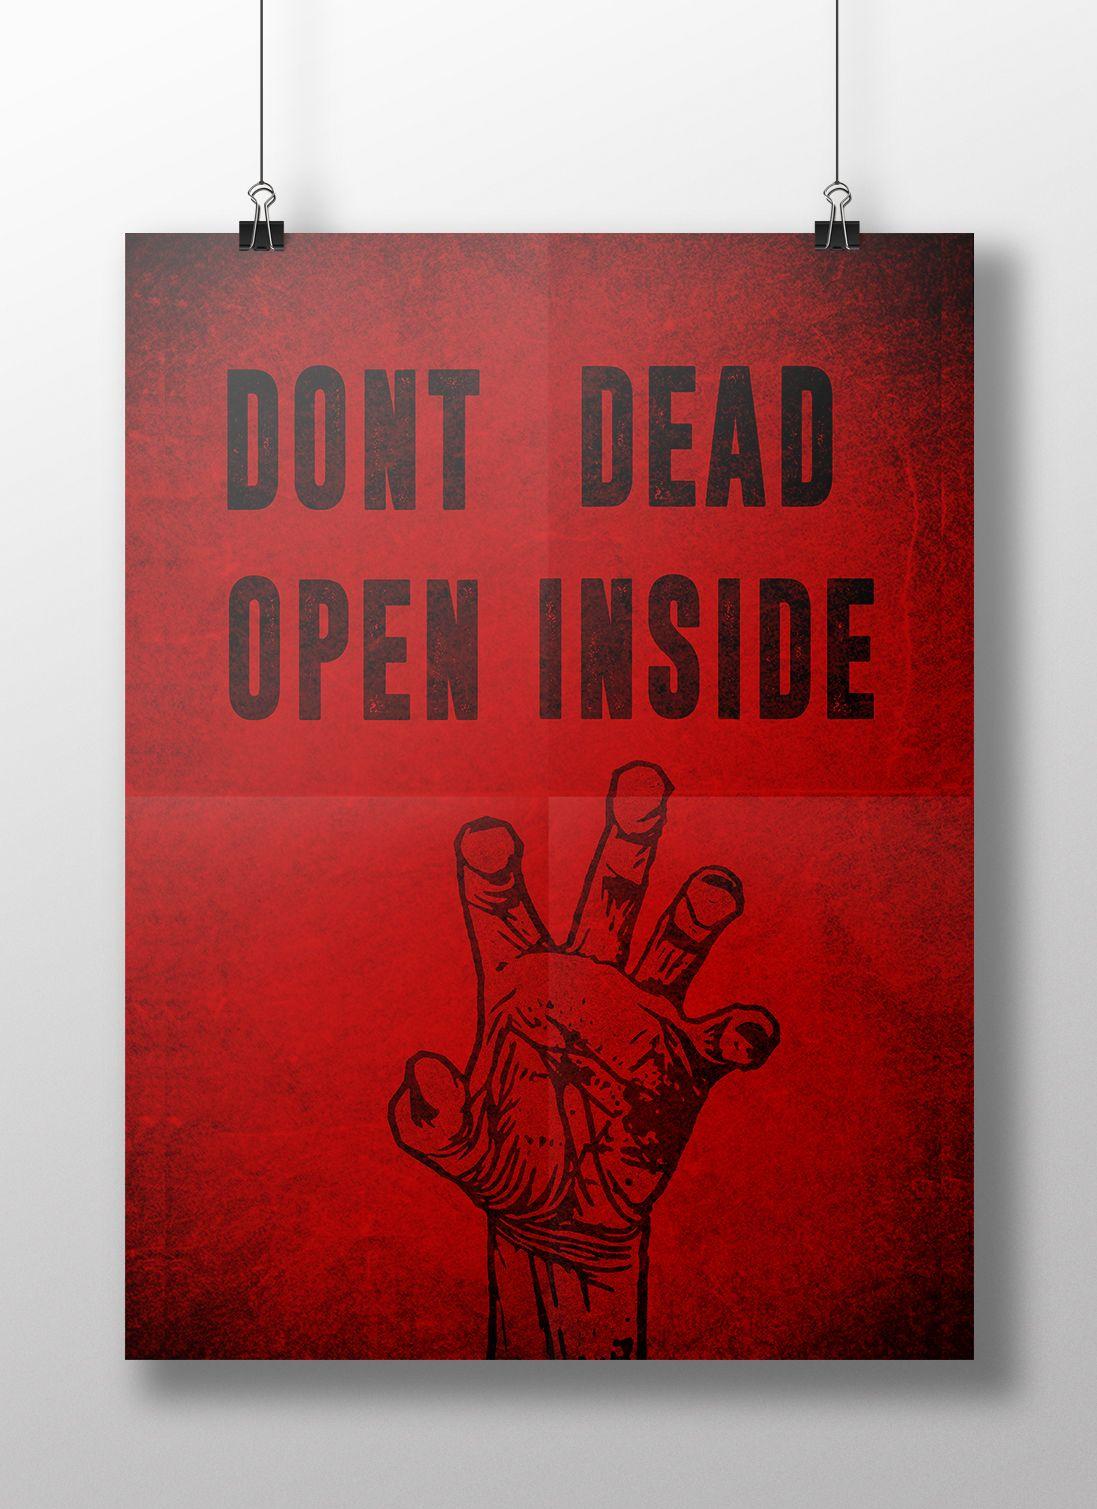 #thewalkingdead #twd #zombies #series #tvshows #decoração #decor #poster #quadro